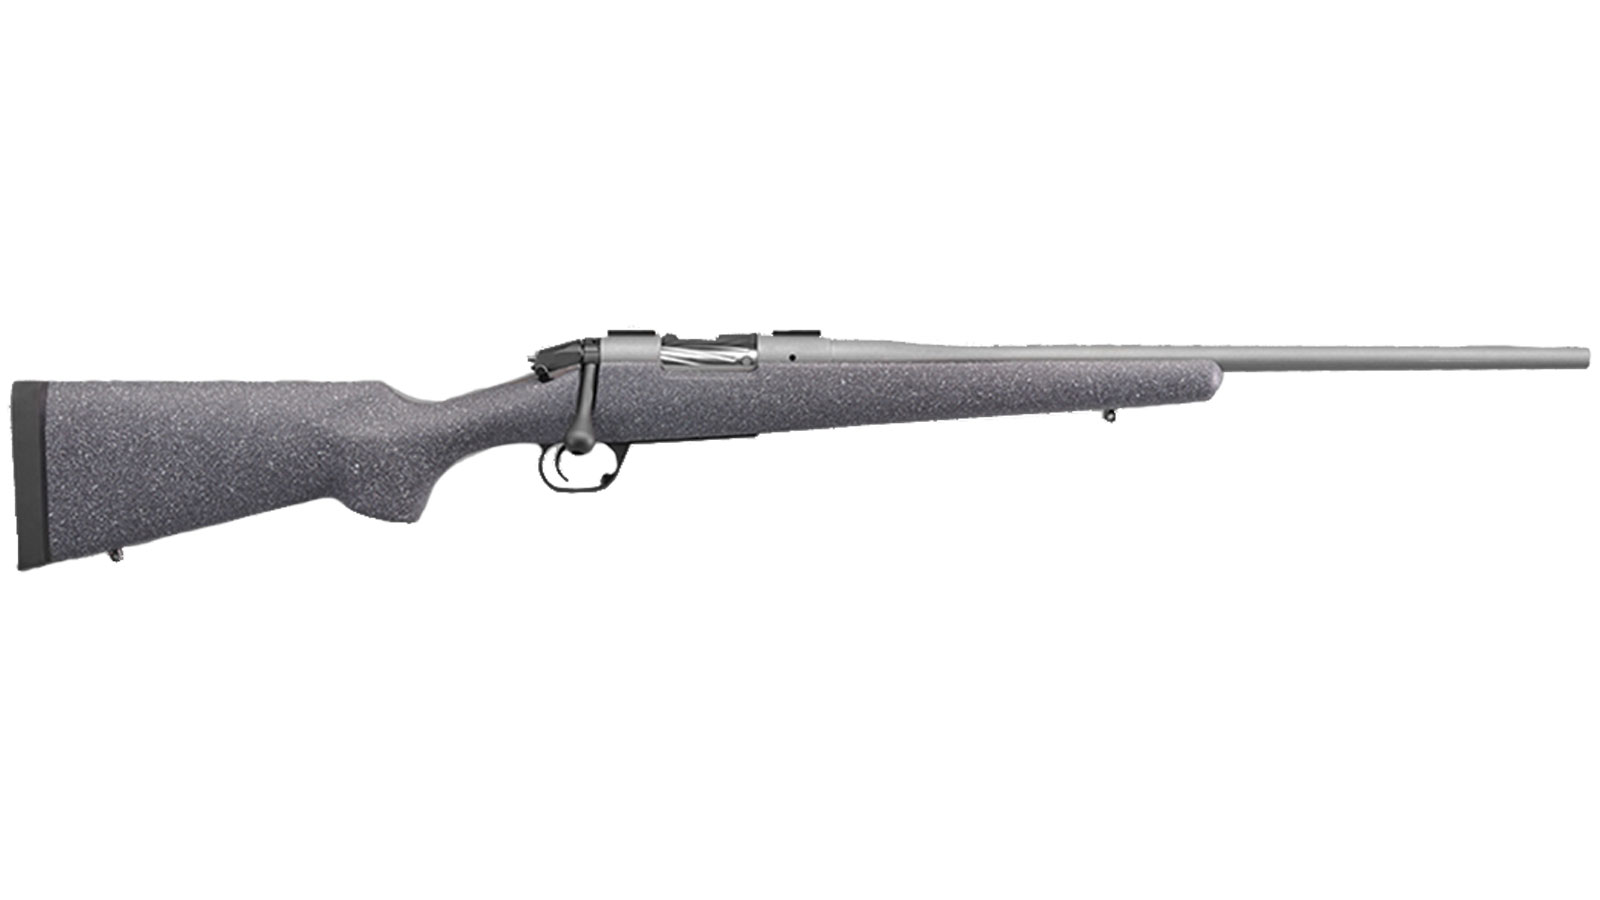 Bergara Rifles BPR1865F Premier Mountain Bolt 6.5 Creedmoor 22 3+1 Carbon Fiber Black Stk Stainless Cerakote in.